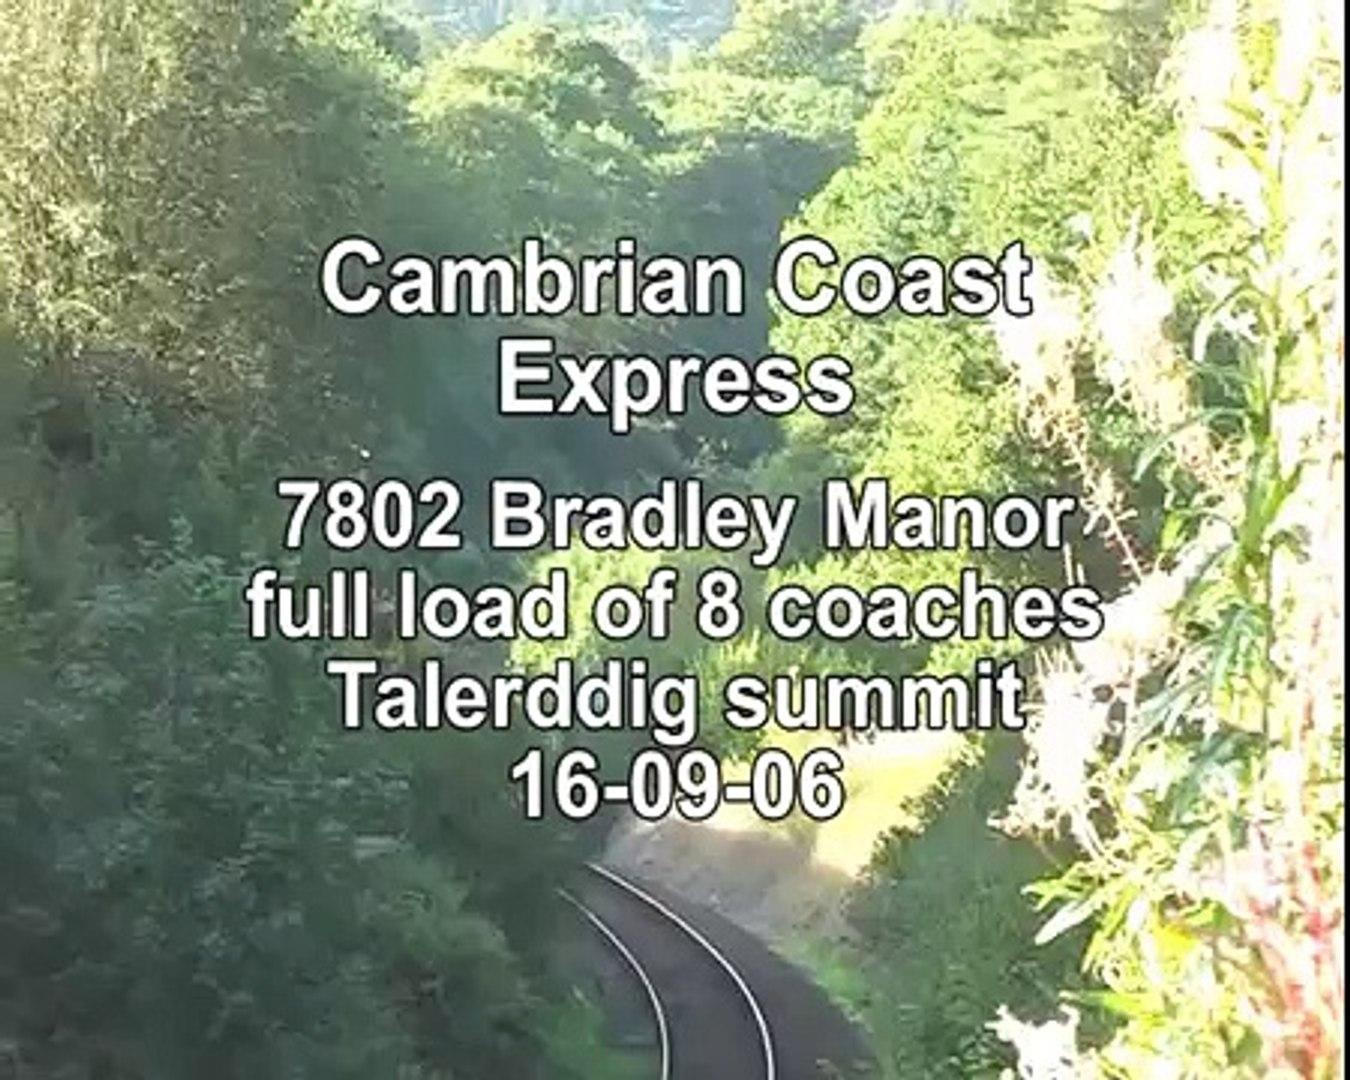 7802 Bradley Manor Talerddig summit